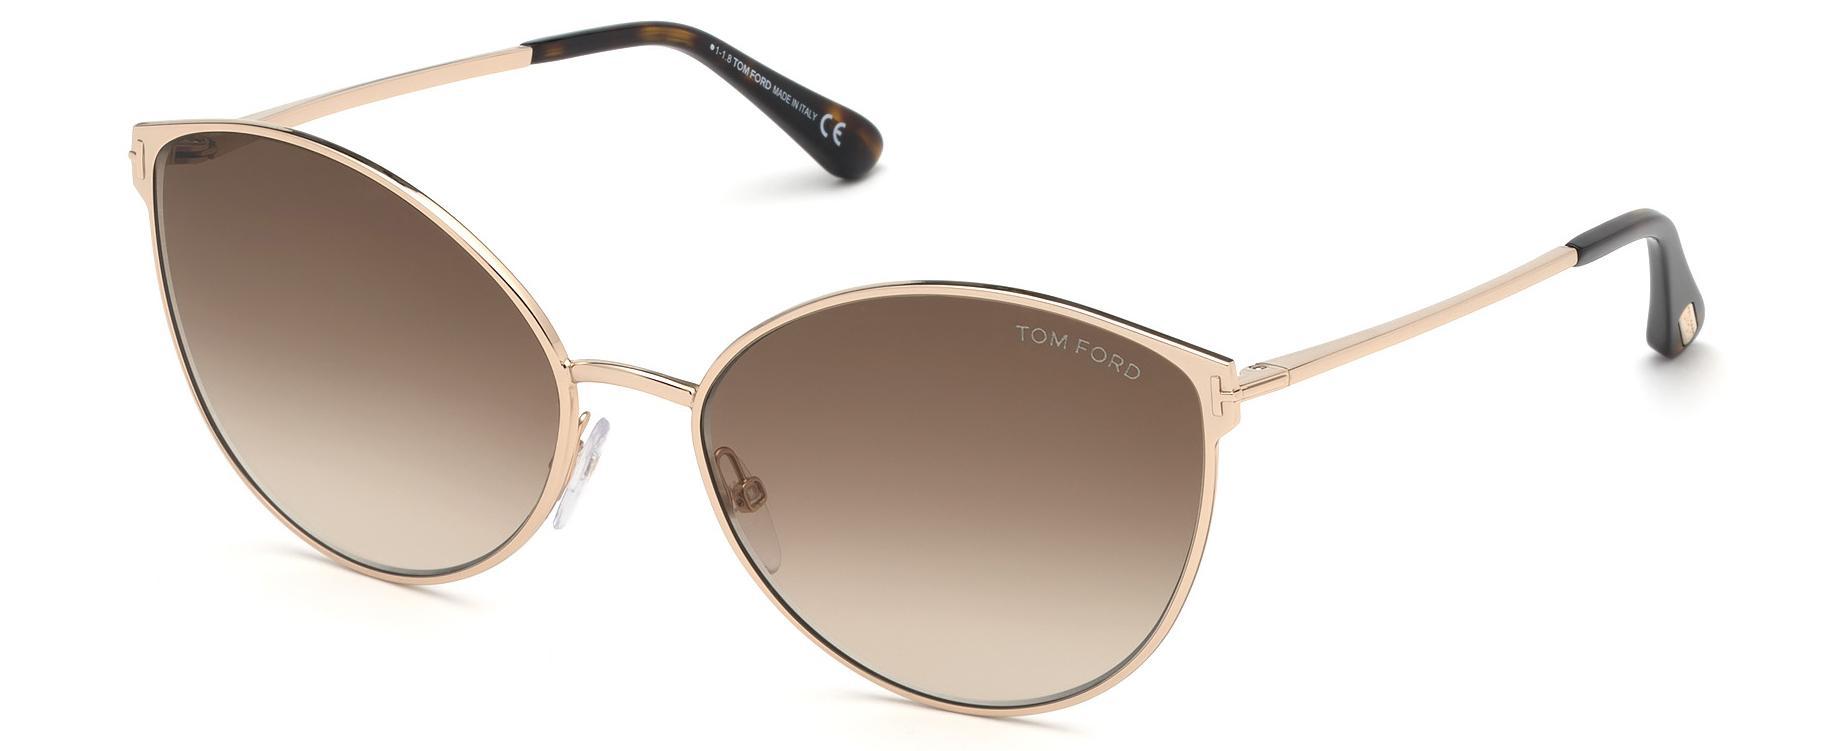 5430723aaf1 Tom Ford - Brown 0654 Zeila Cat Eye Sunglasses - Lyst. View fullscreen